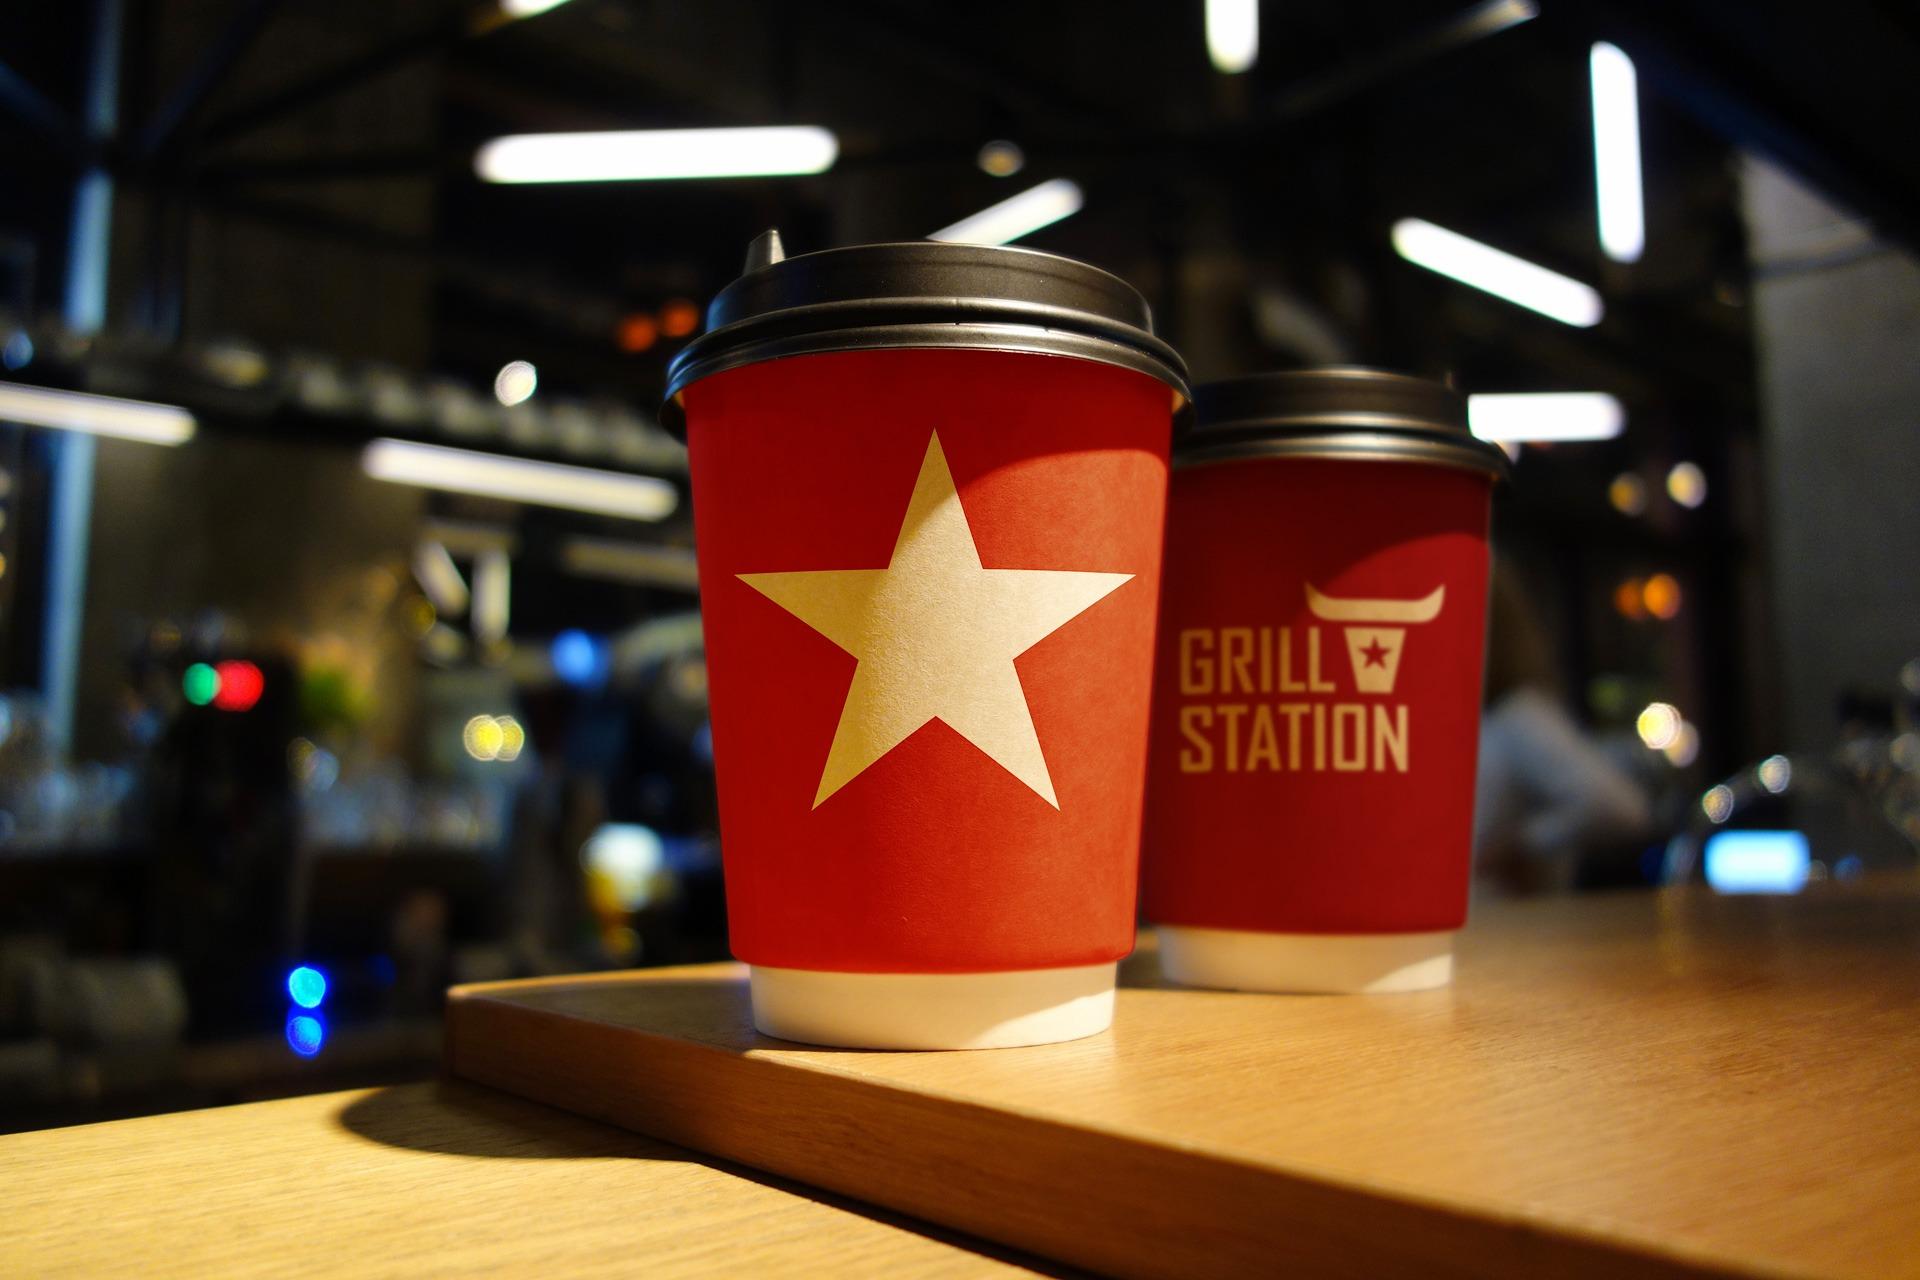 Брендинг упаковки, Асгард брендинг, брендинг ресторана Grill Station, branding design identity